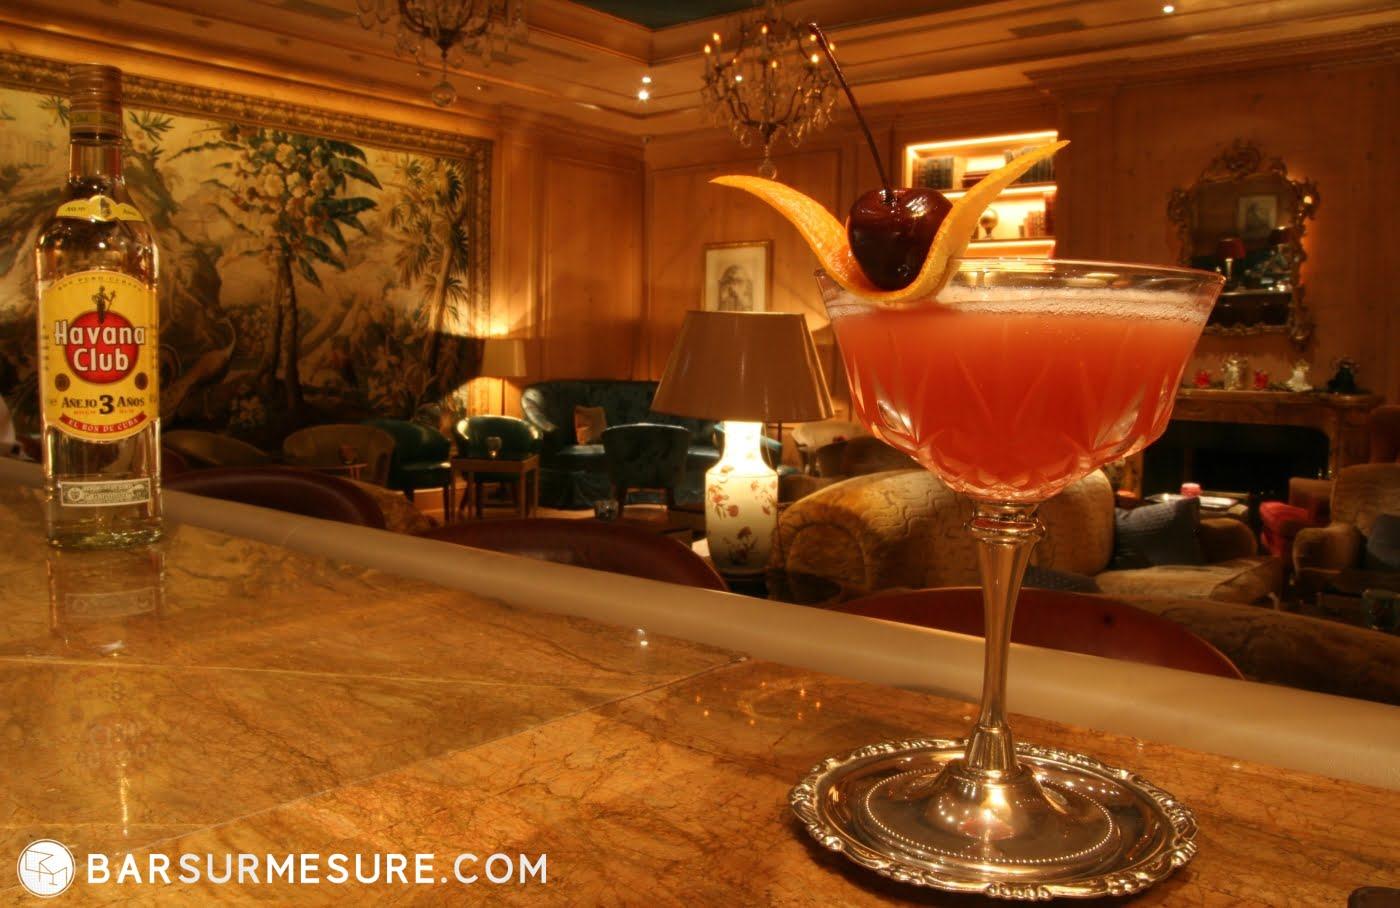 bar sur mesure station custom cocktail bar the cuban balance alexis taoufiq